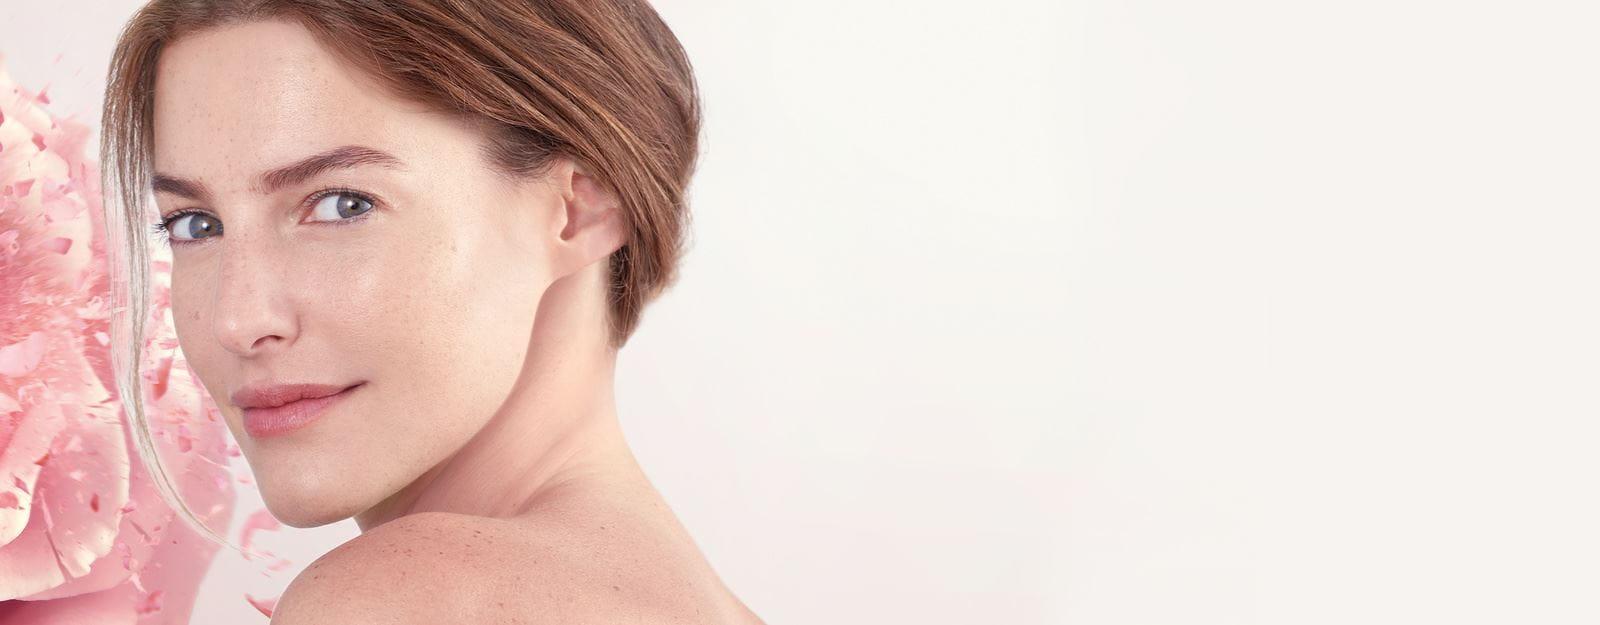 florena female model